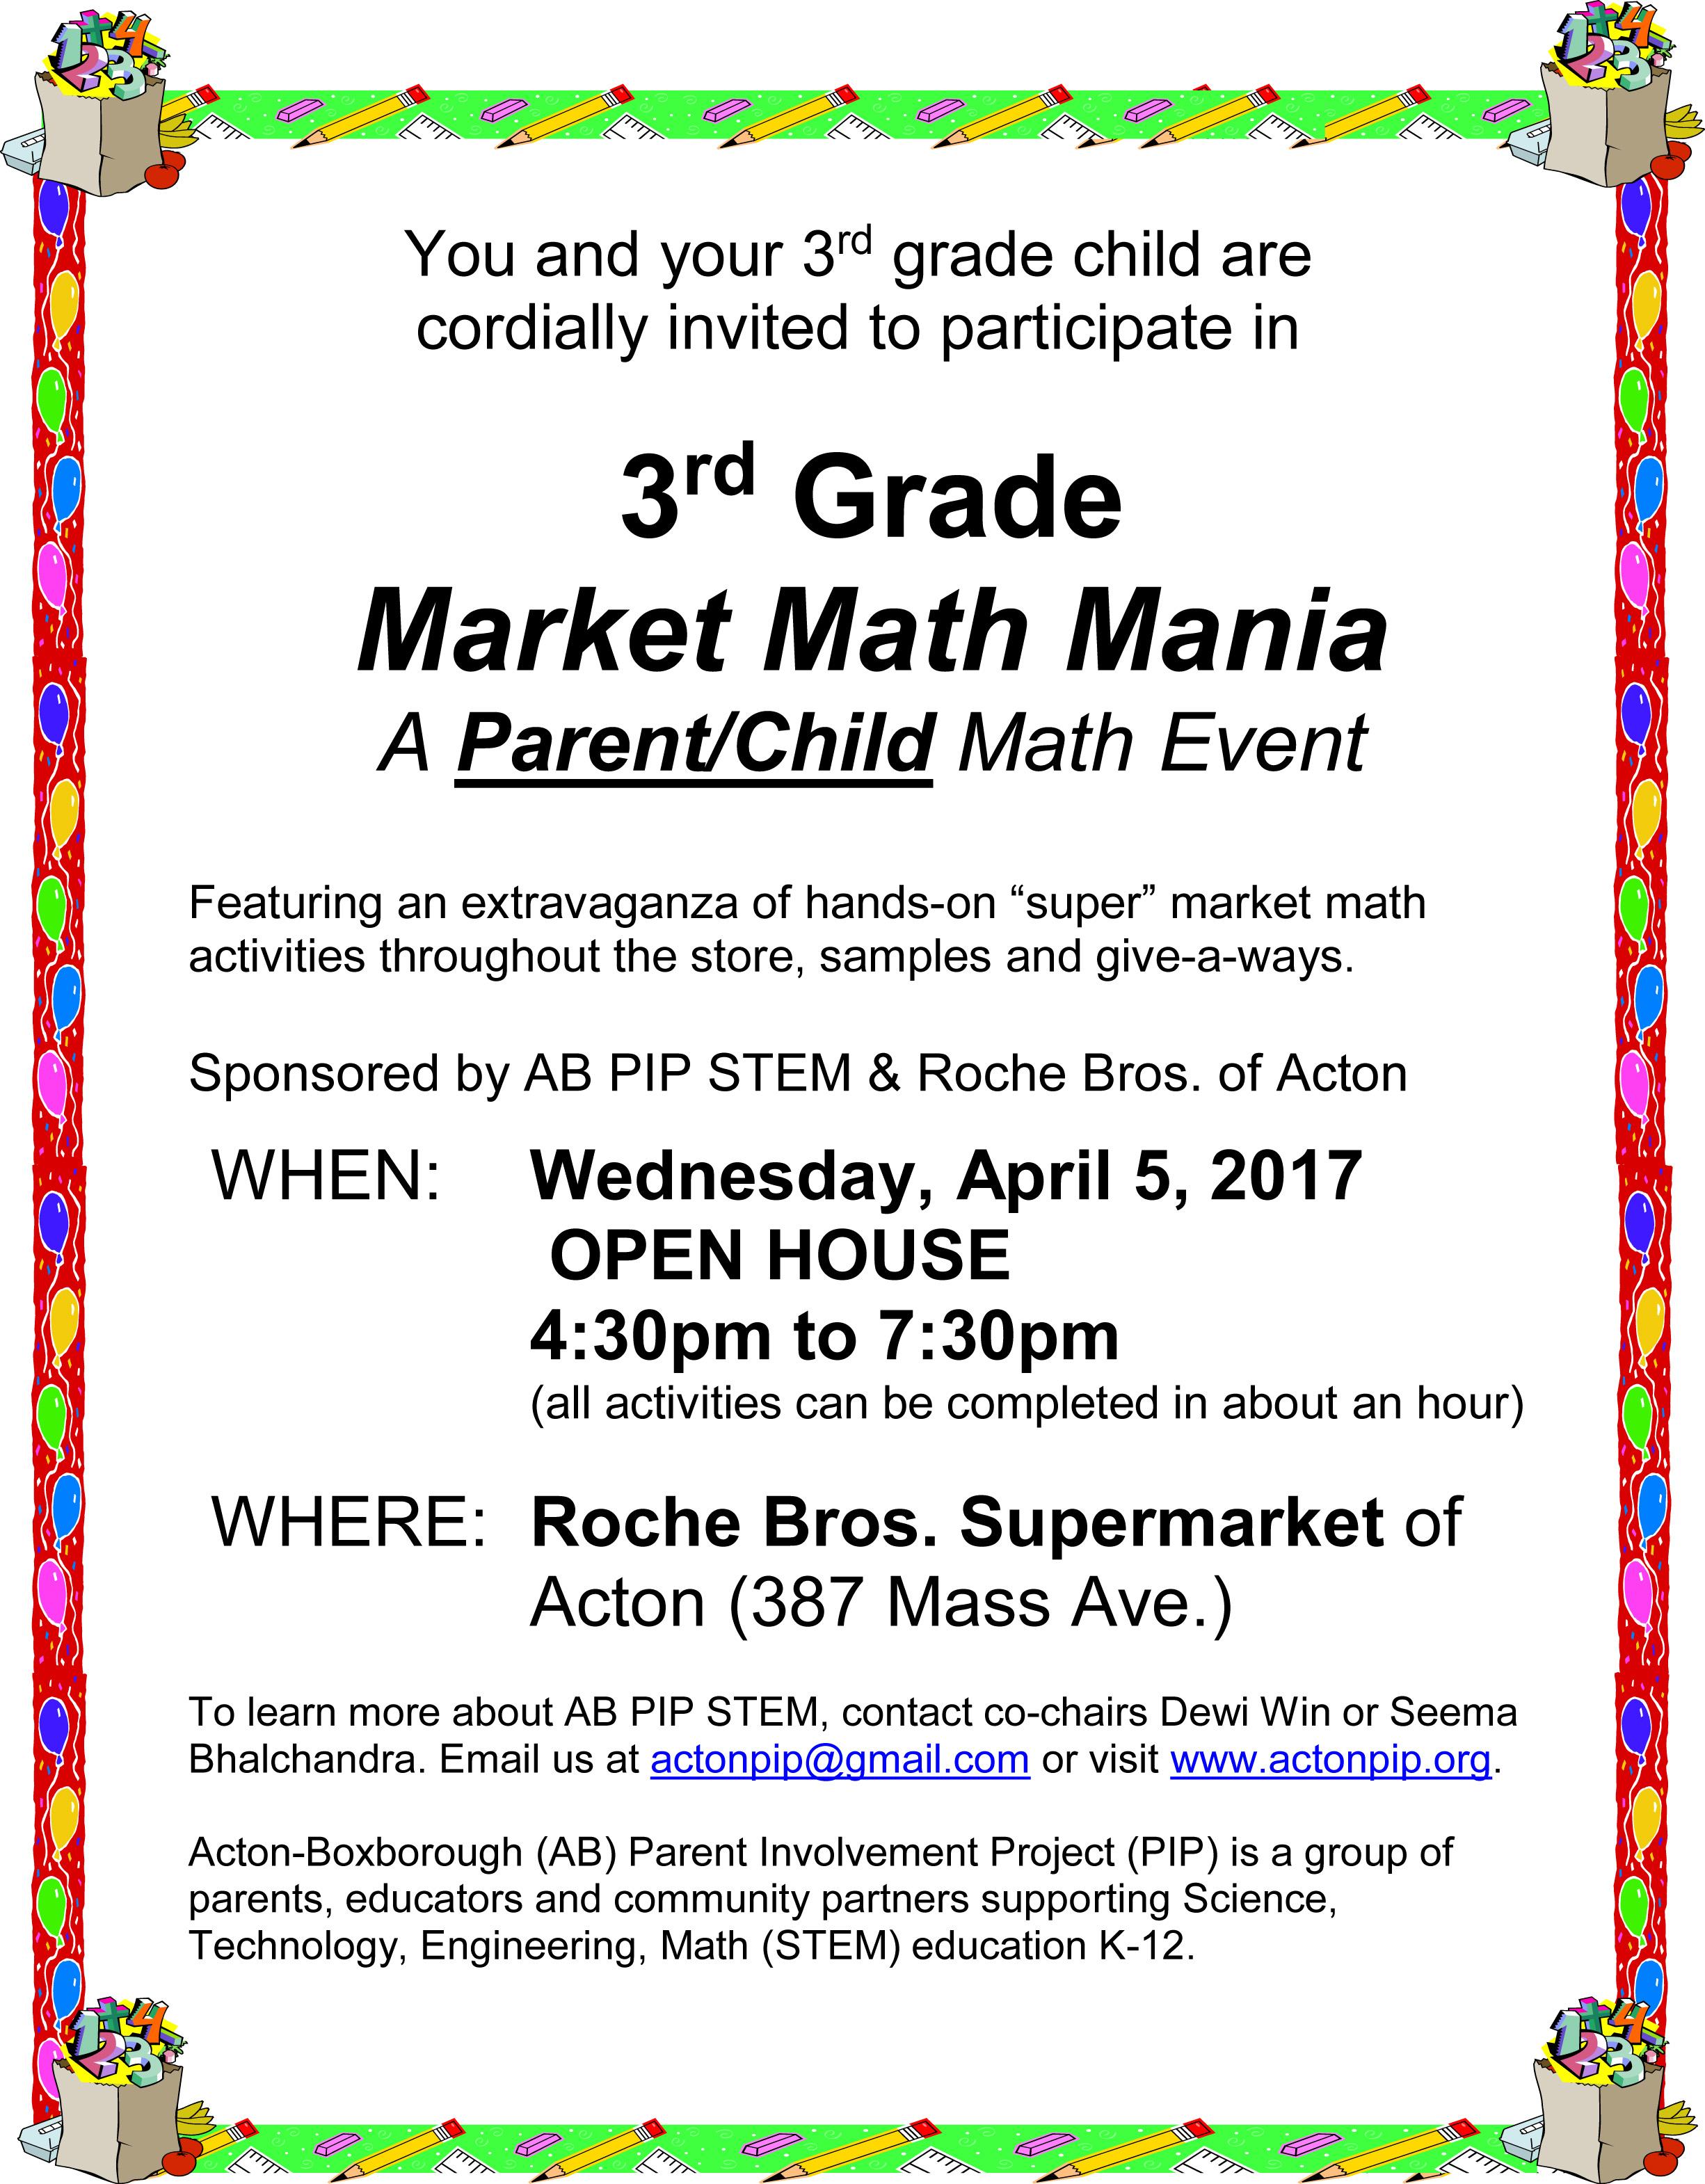 3rd Grade Market Math Mania @ Roche Bros. Supermarket | Acton | Massachusetts | United States